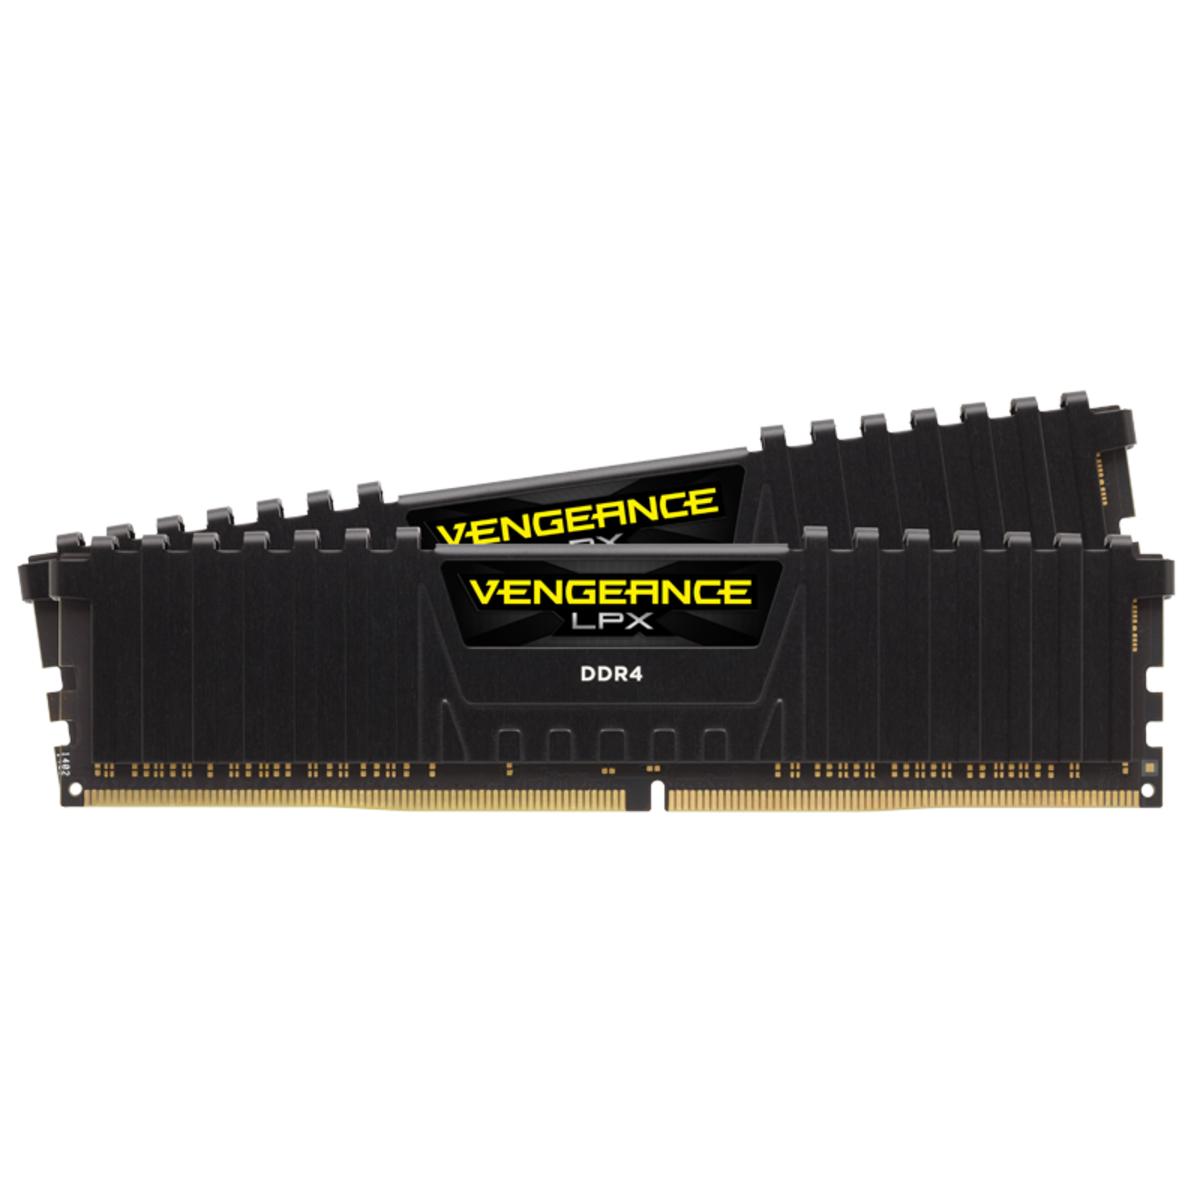 Corsair Vengeance LPX Black 16GB (2x8GB) 3600MHz